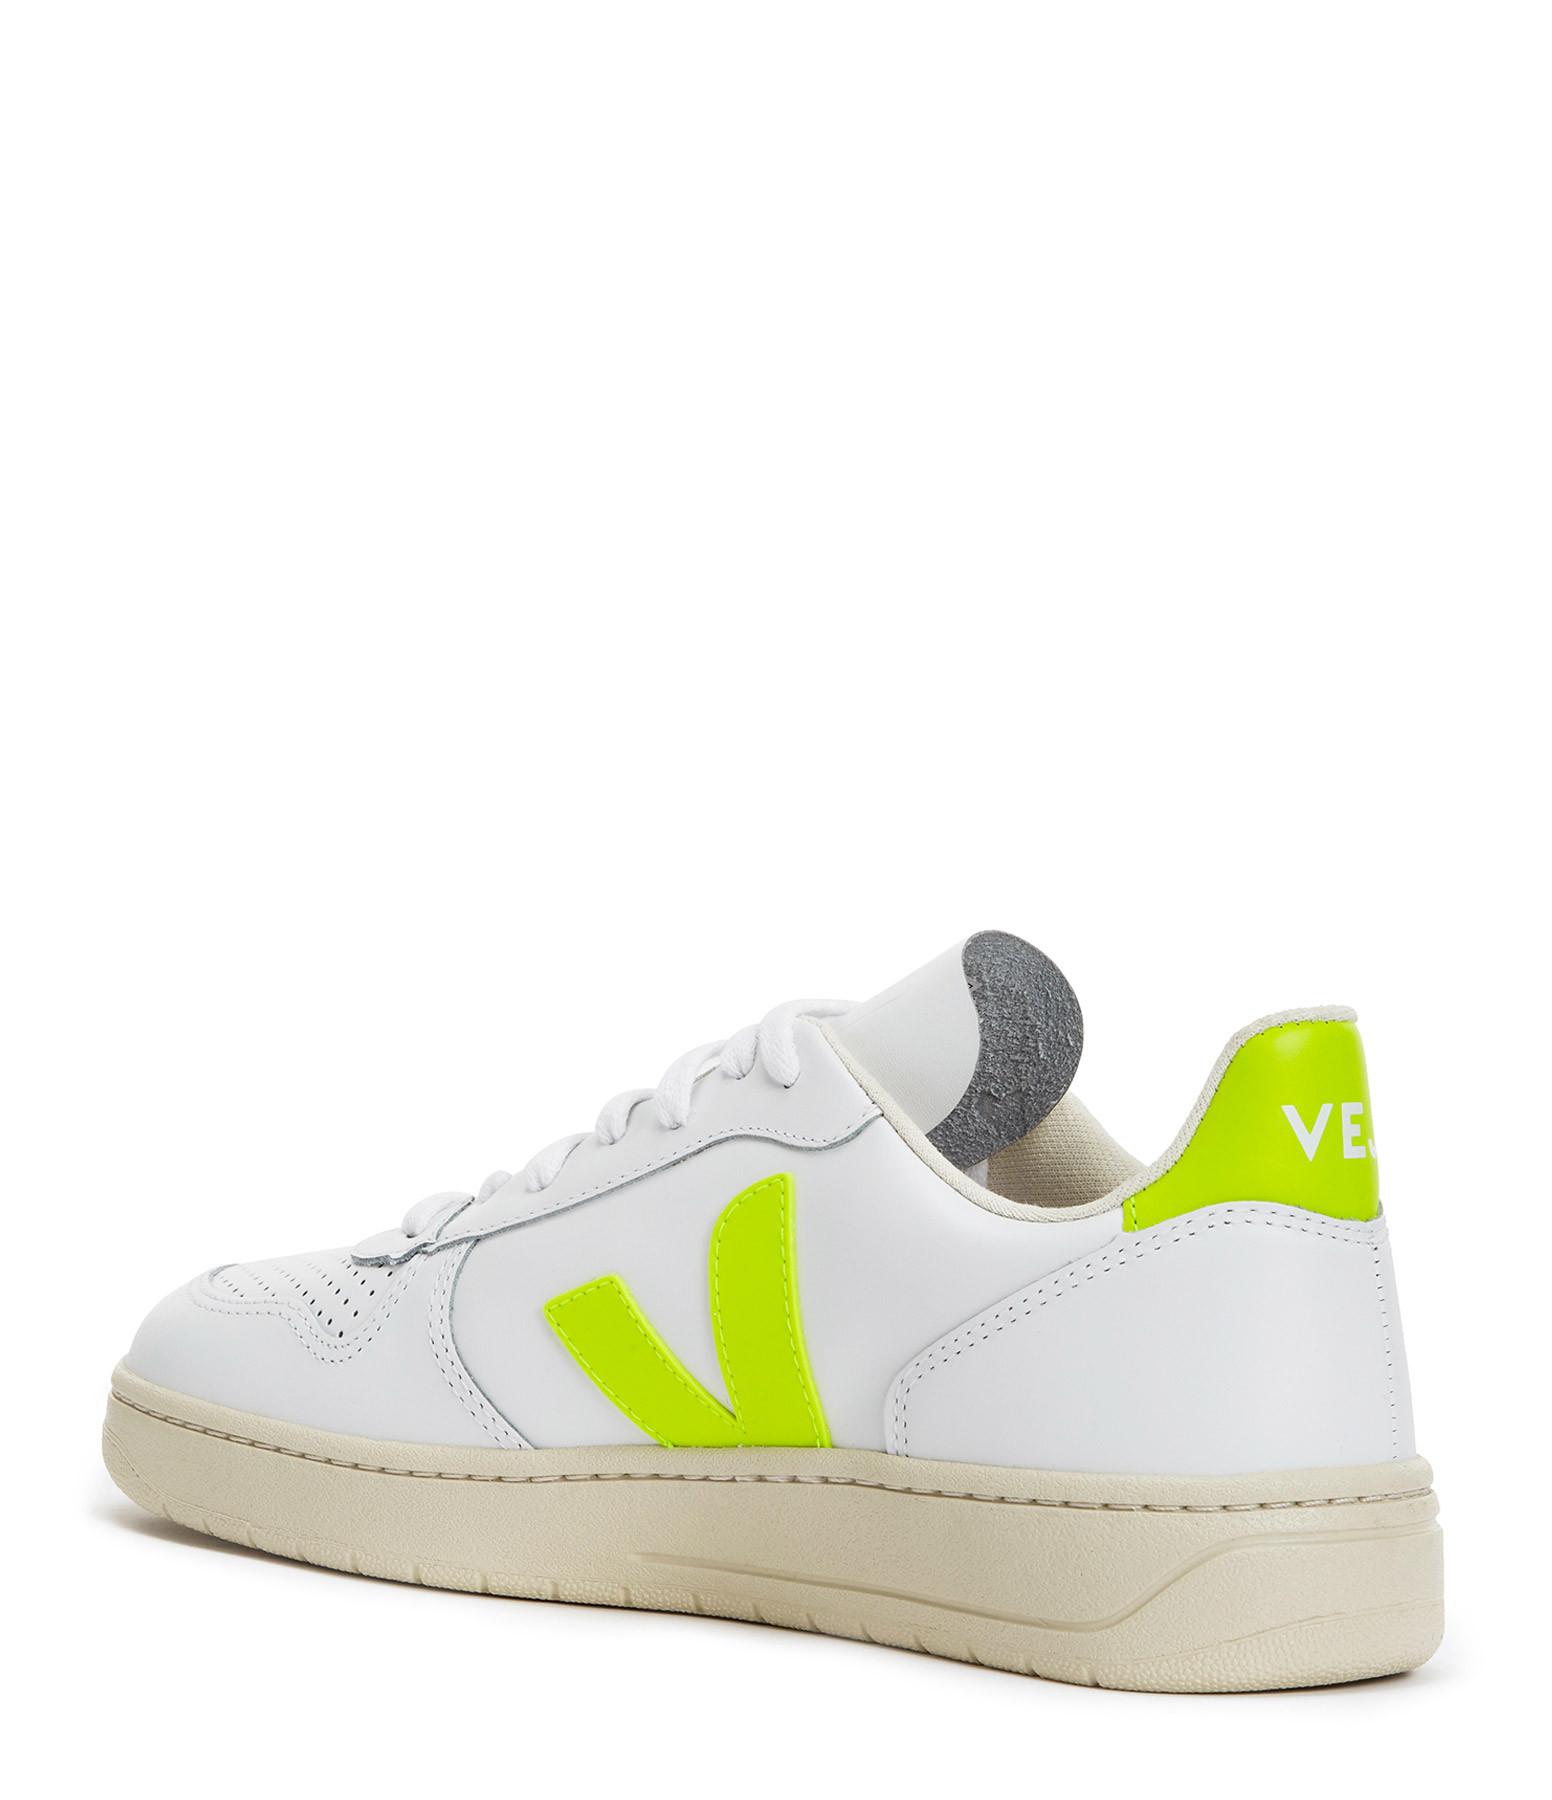 VEJA - Baskets V-10 Cuir Extra Blanc Jaune Fluo